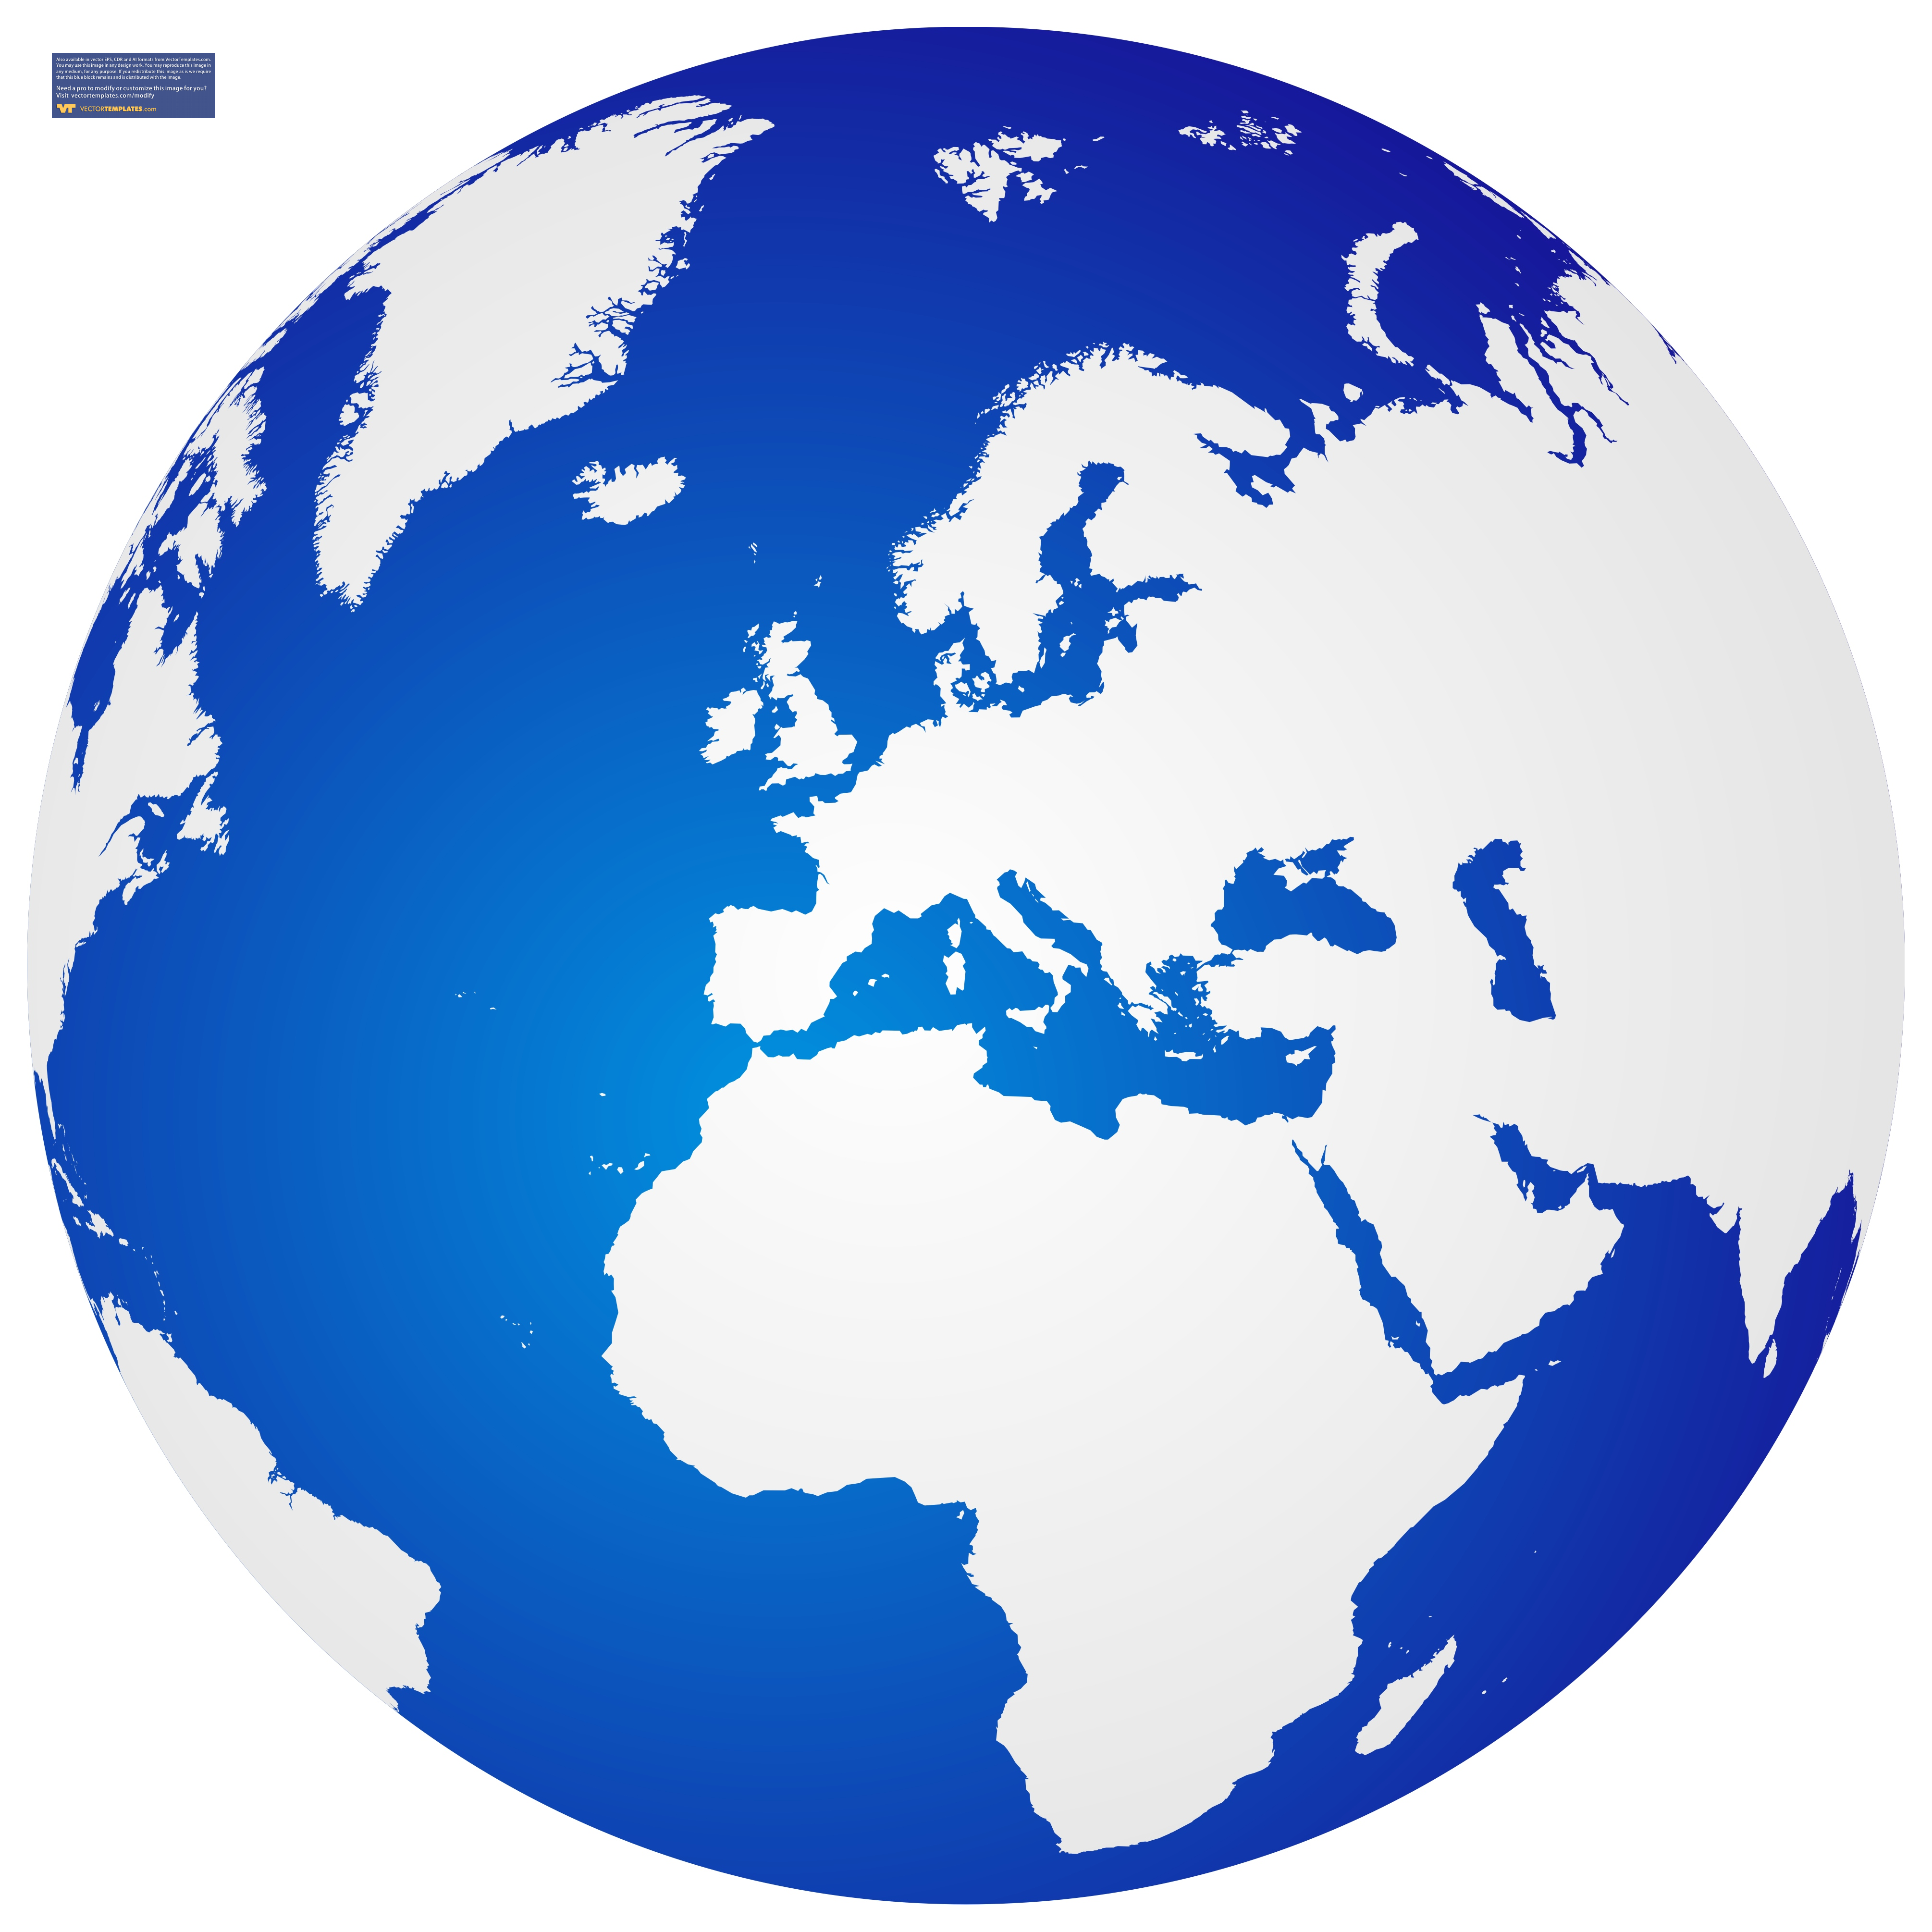 4021x4021 Clipart World Globe